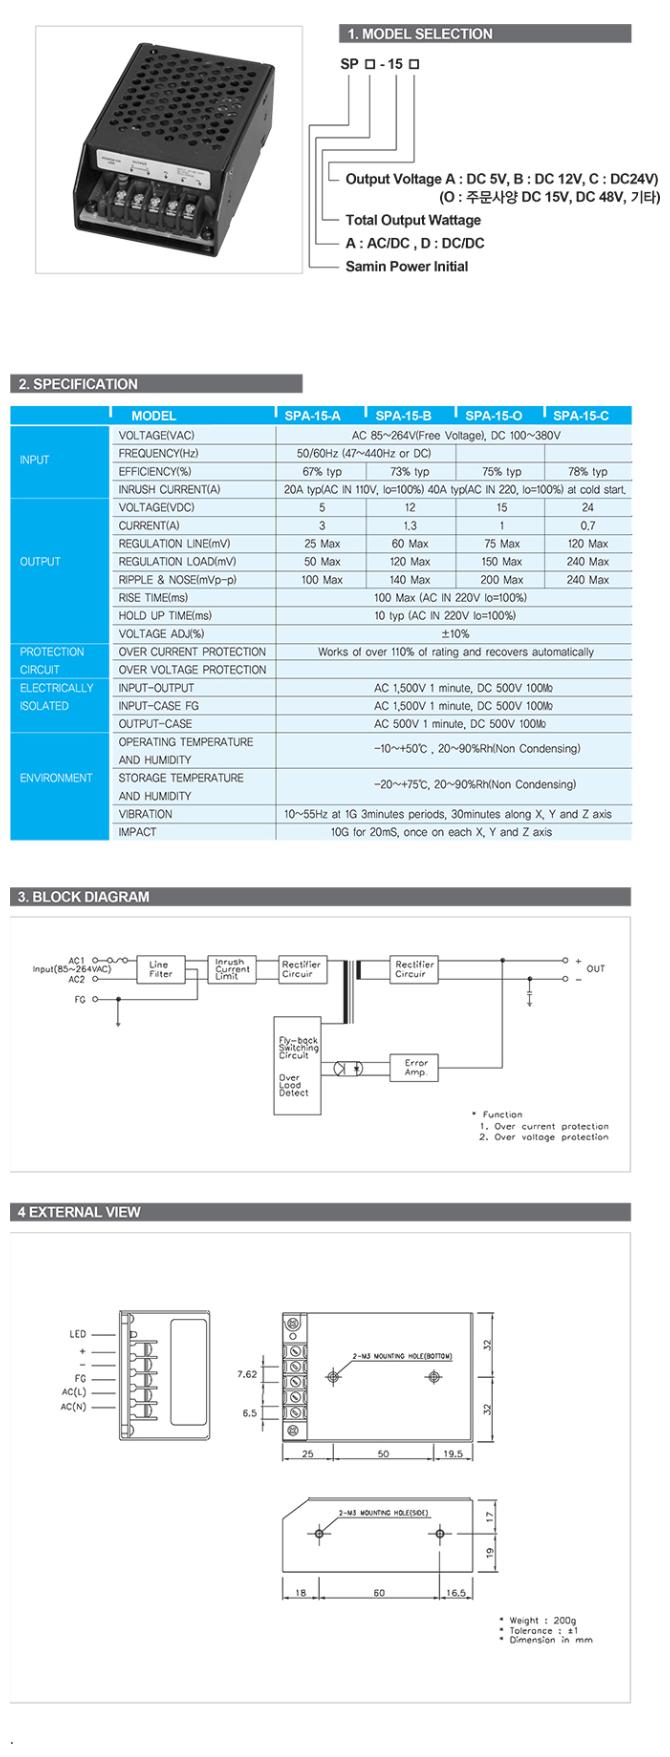 Samin Technology 15 Watt AC-DC Switching Power Supplies SPA-15-Series